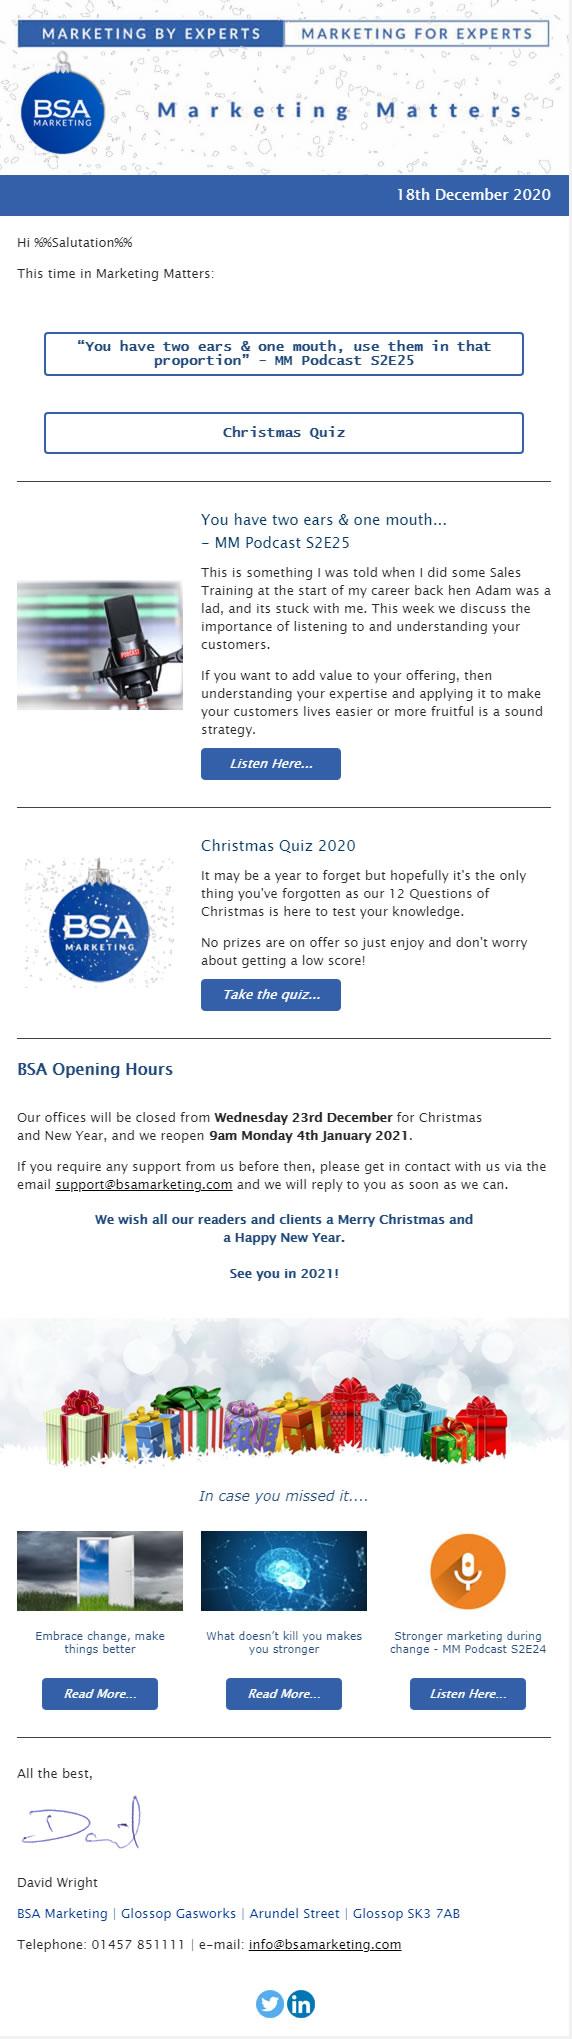 bsa-email-christmas